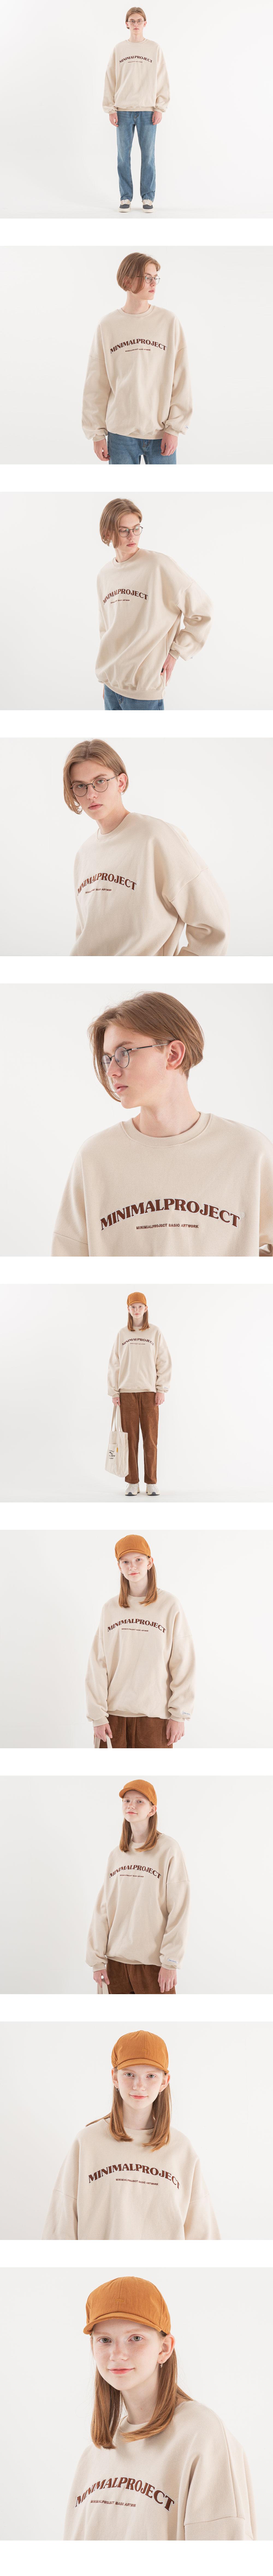 [minimal project] 미니멀프로젝트 아치 자수 오버핏 맨투맨 MMT104 [CREAMBEIGE]